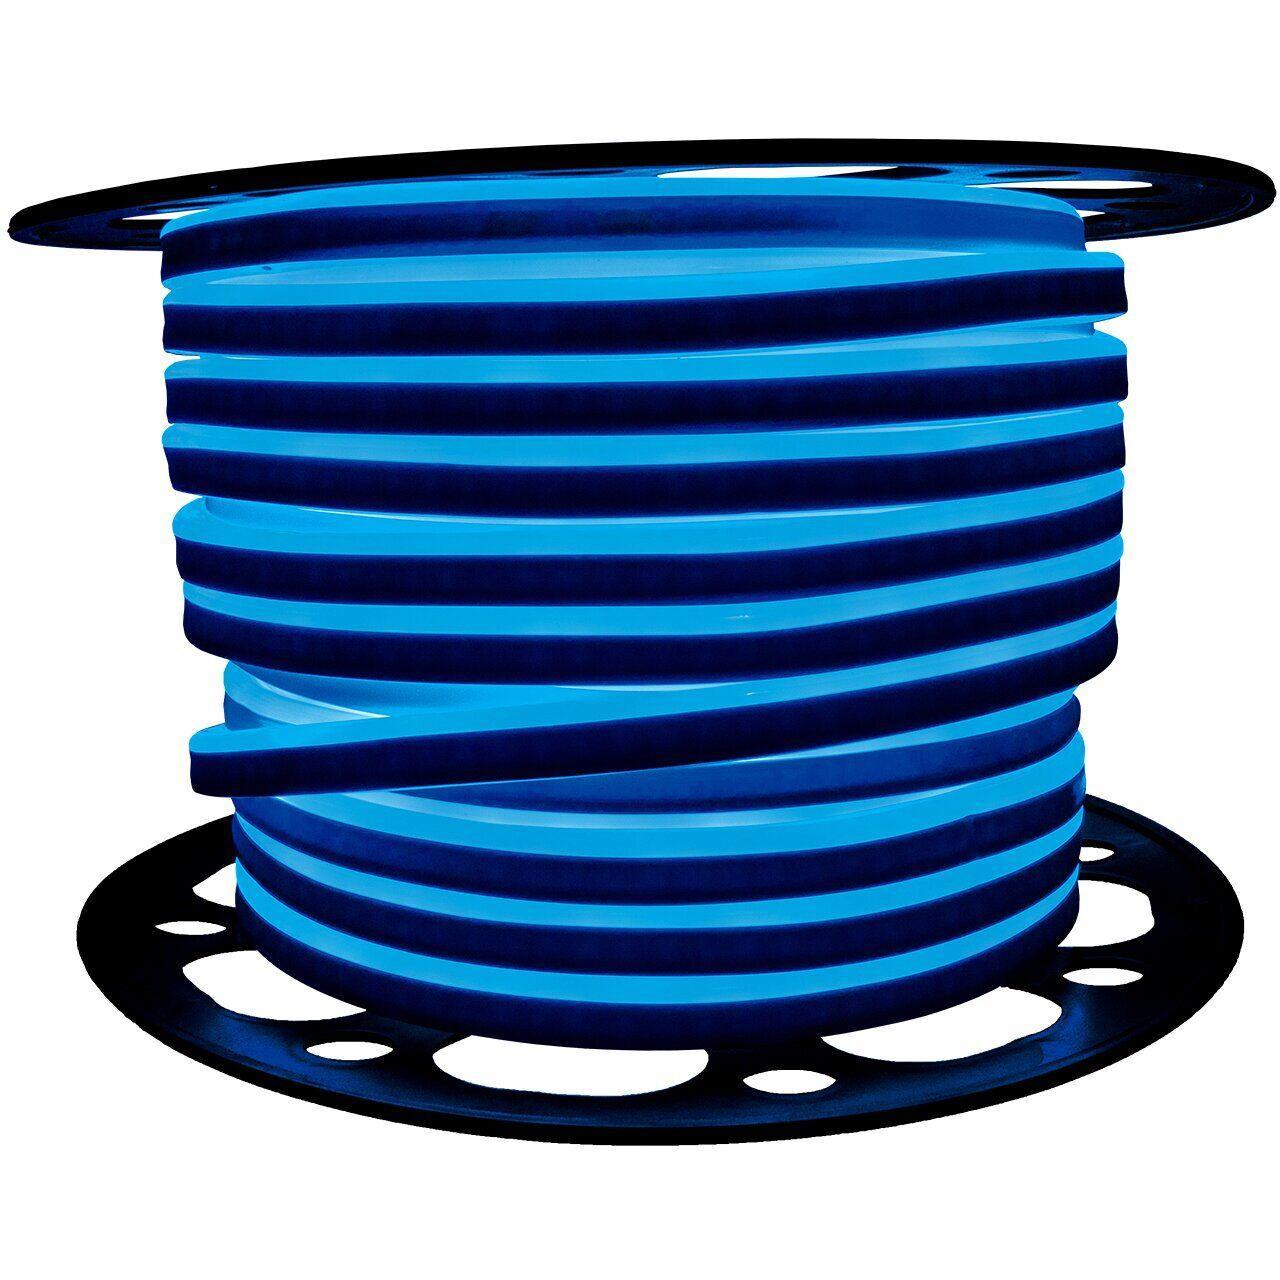 "Светодиодный неон PROLUM Silicone 2835120 8x16 IP68 12V SERIES ""SF"" PRO, Синий"